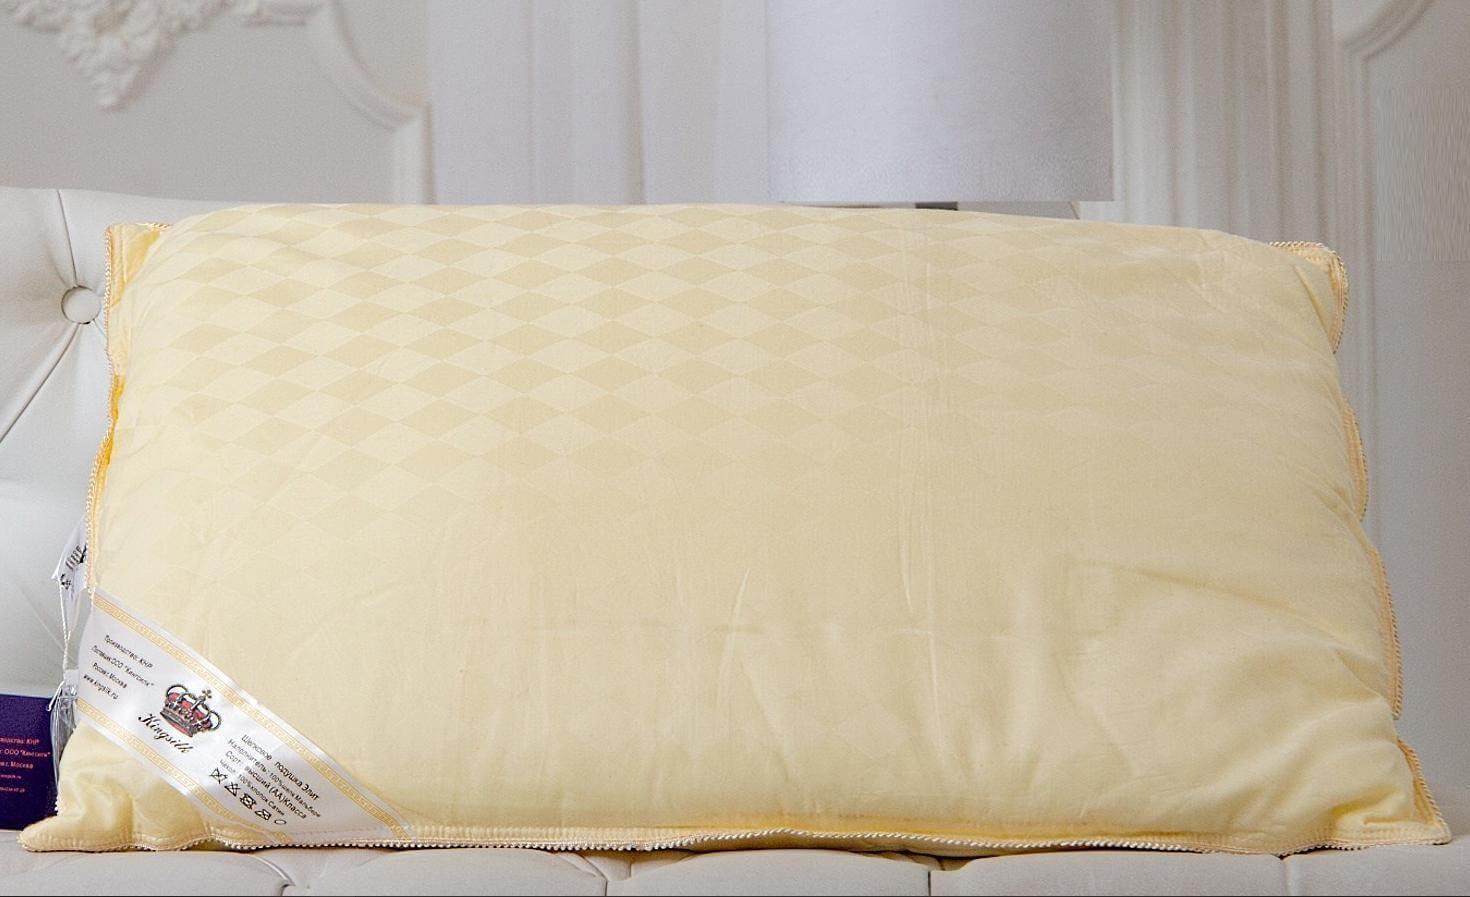 Шелковая подушка Kingsilk Elisabeth Элит 50х70 (1.2 кг) - Detskoye-Postelnoe.Ru